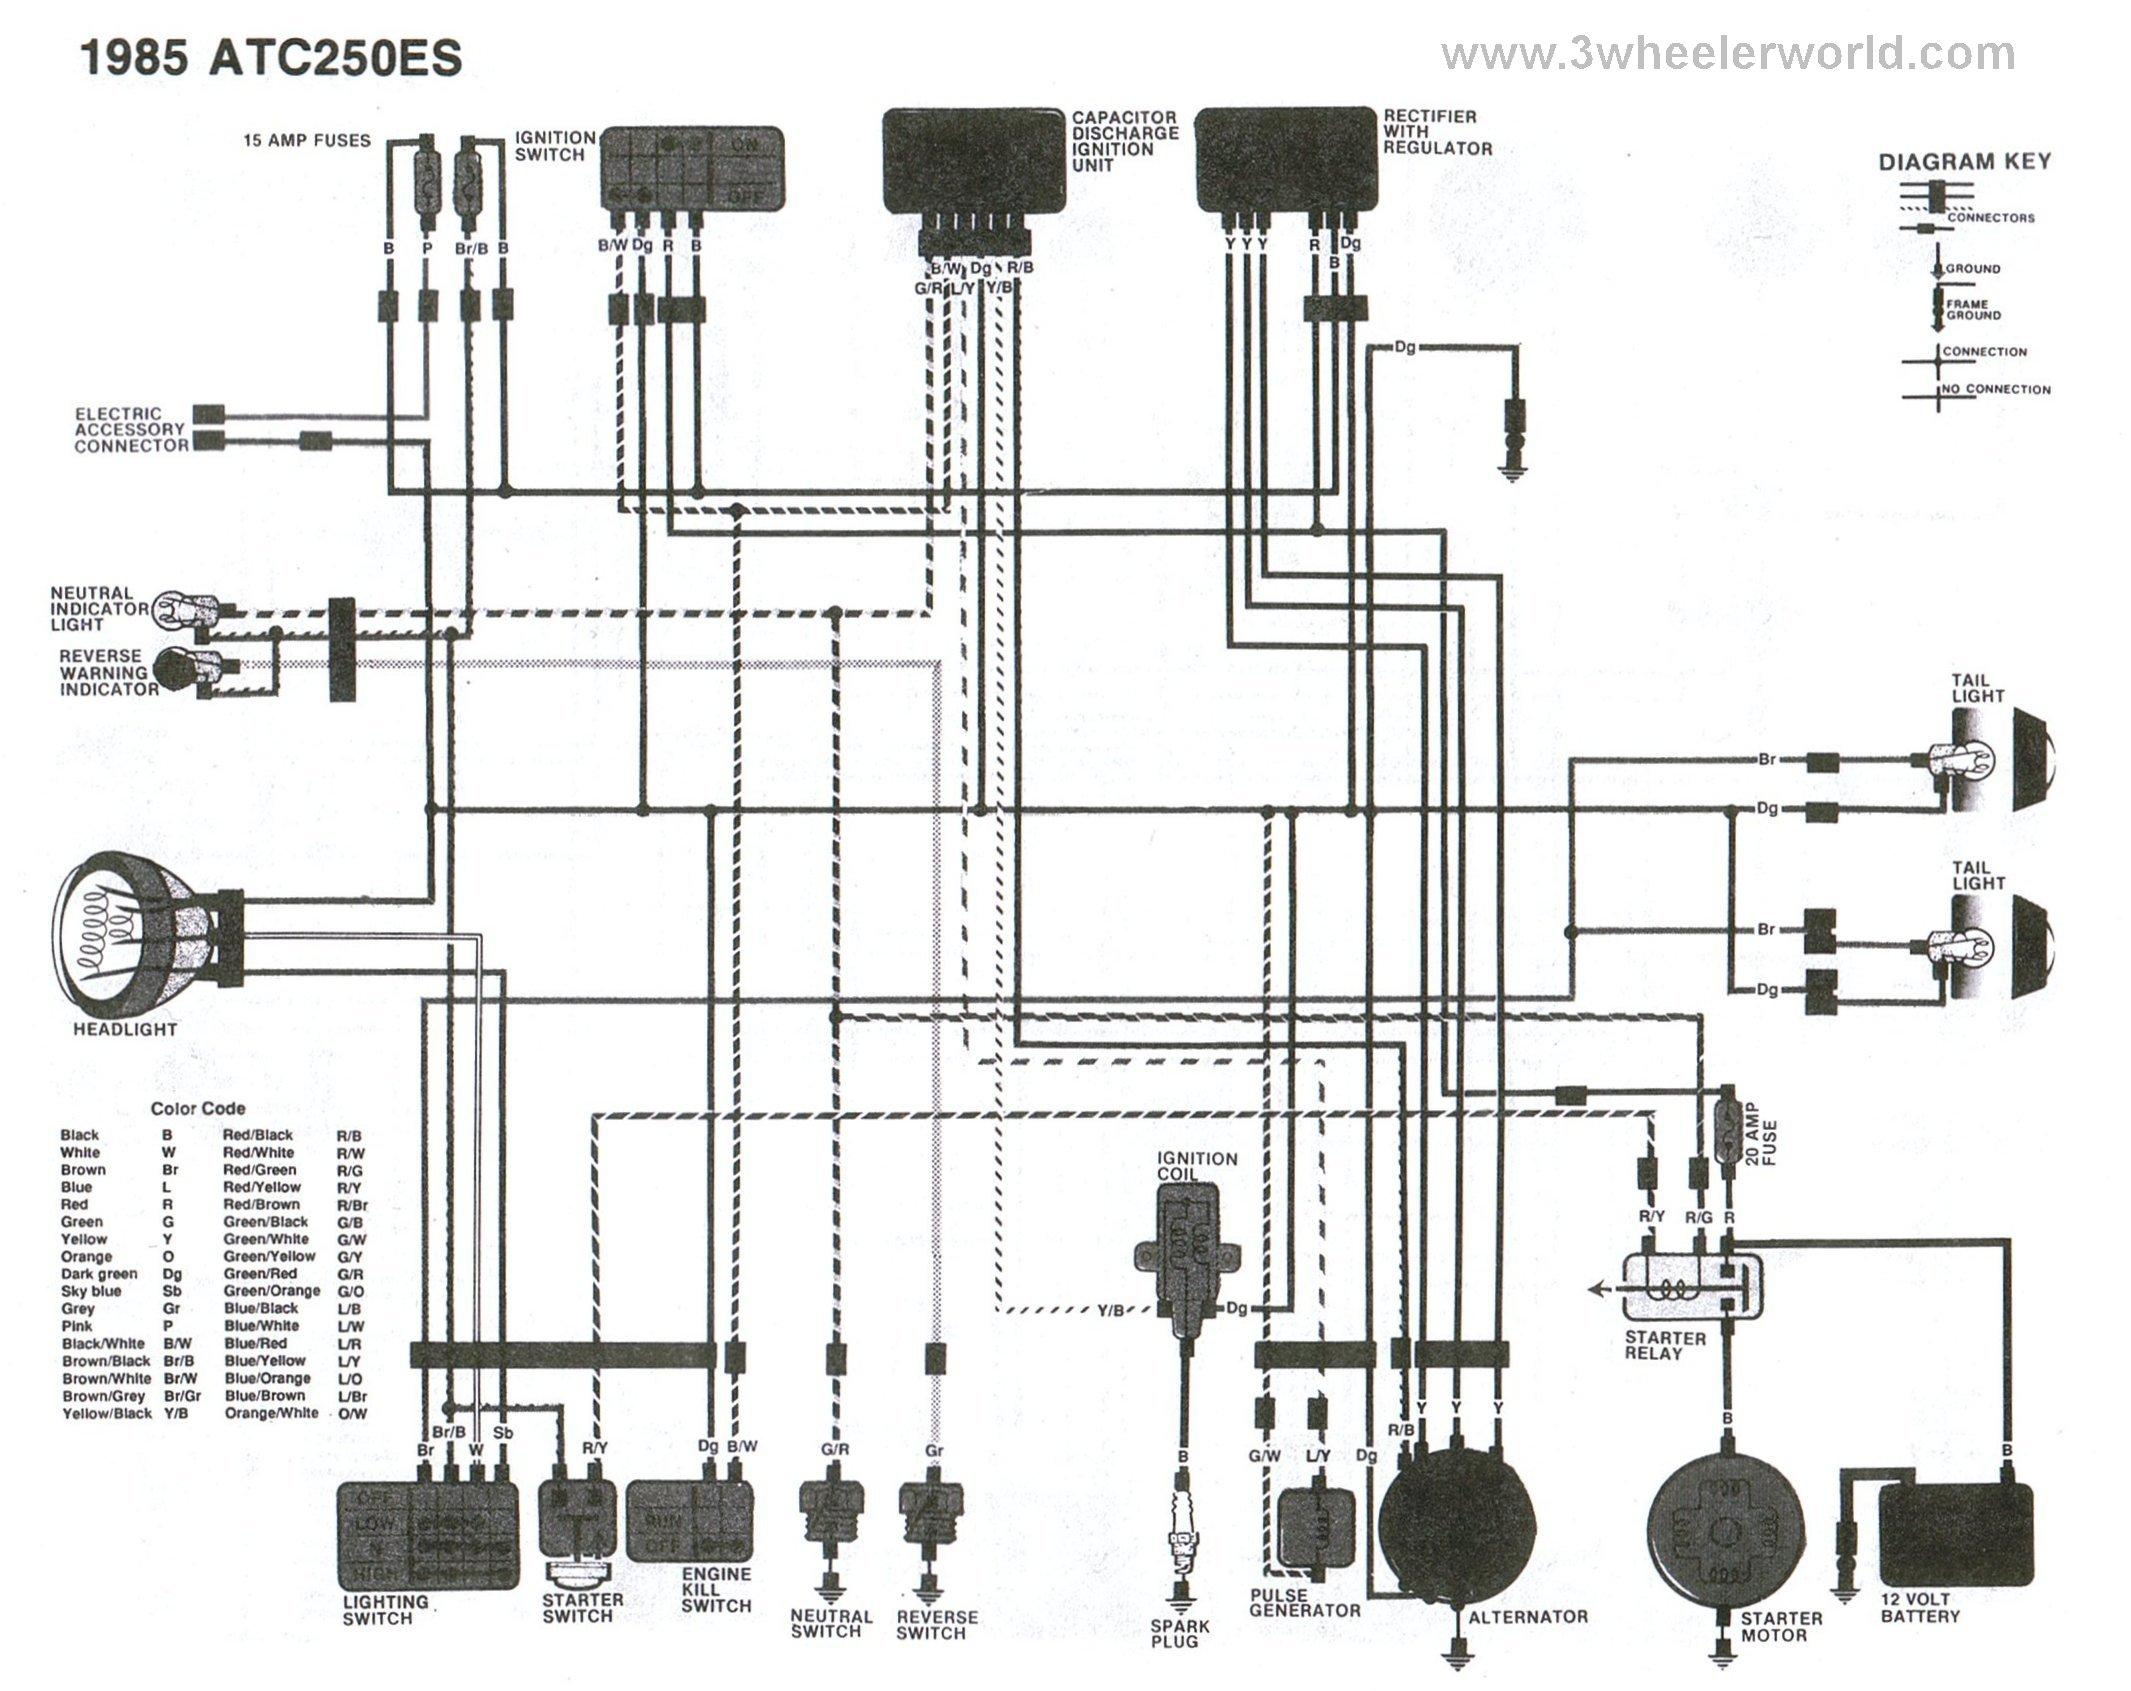 1982 Kawasaki Wiring Diagrams 200 Schematics Diagram For 85 Ninja 6 Atv